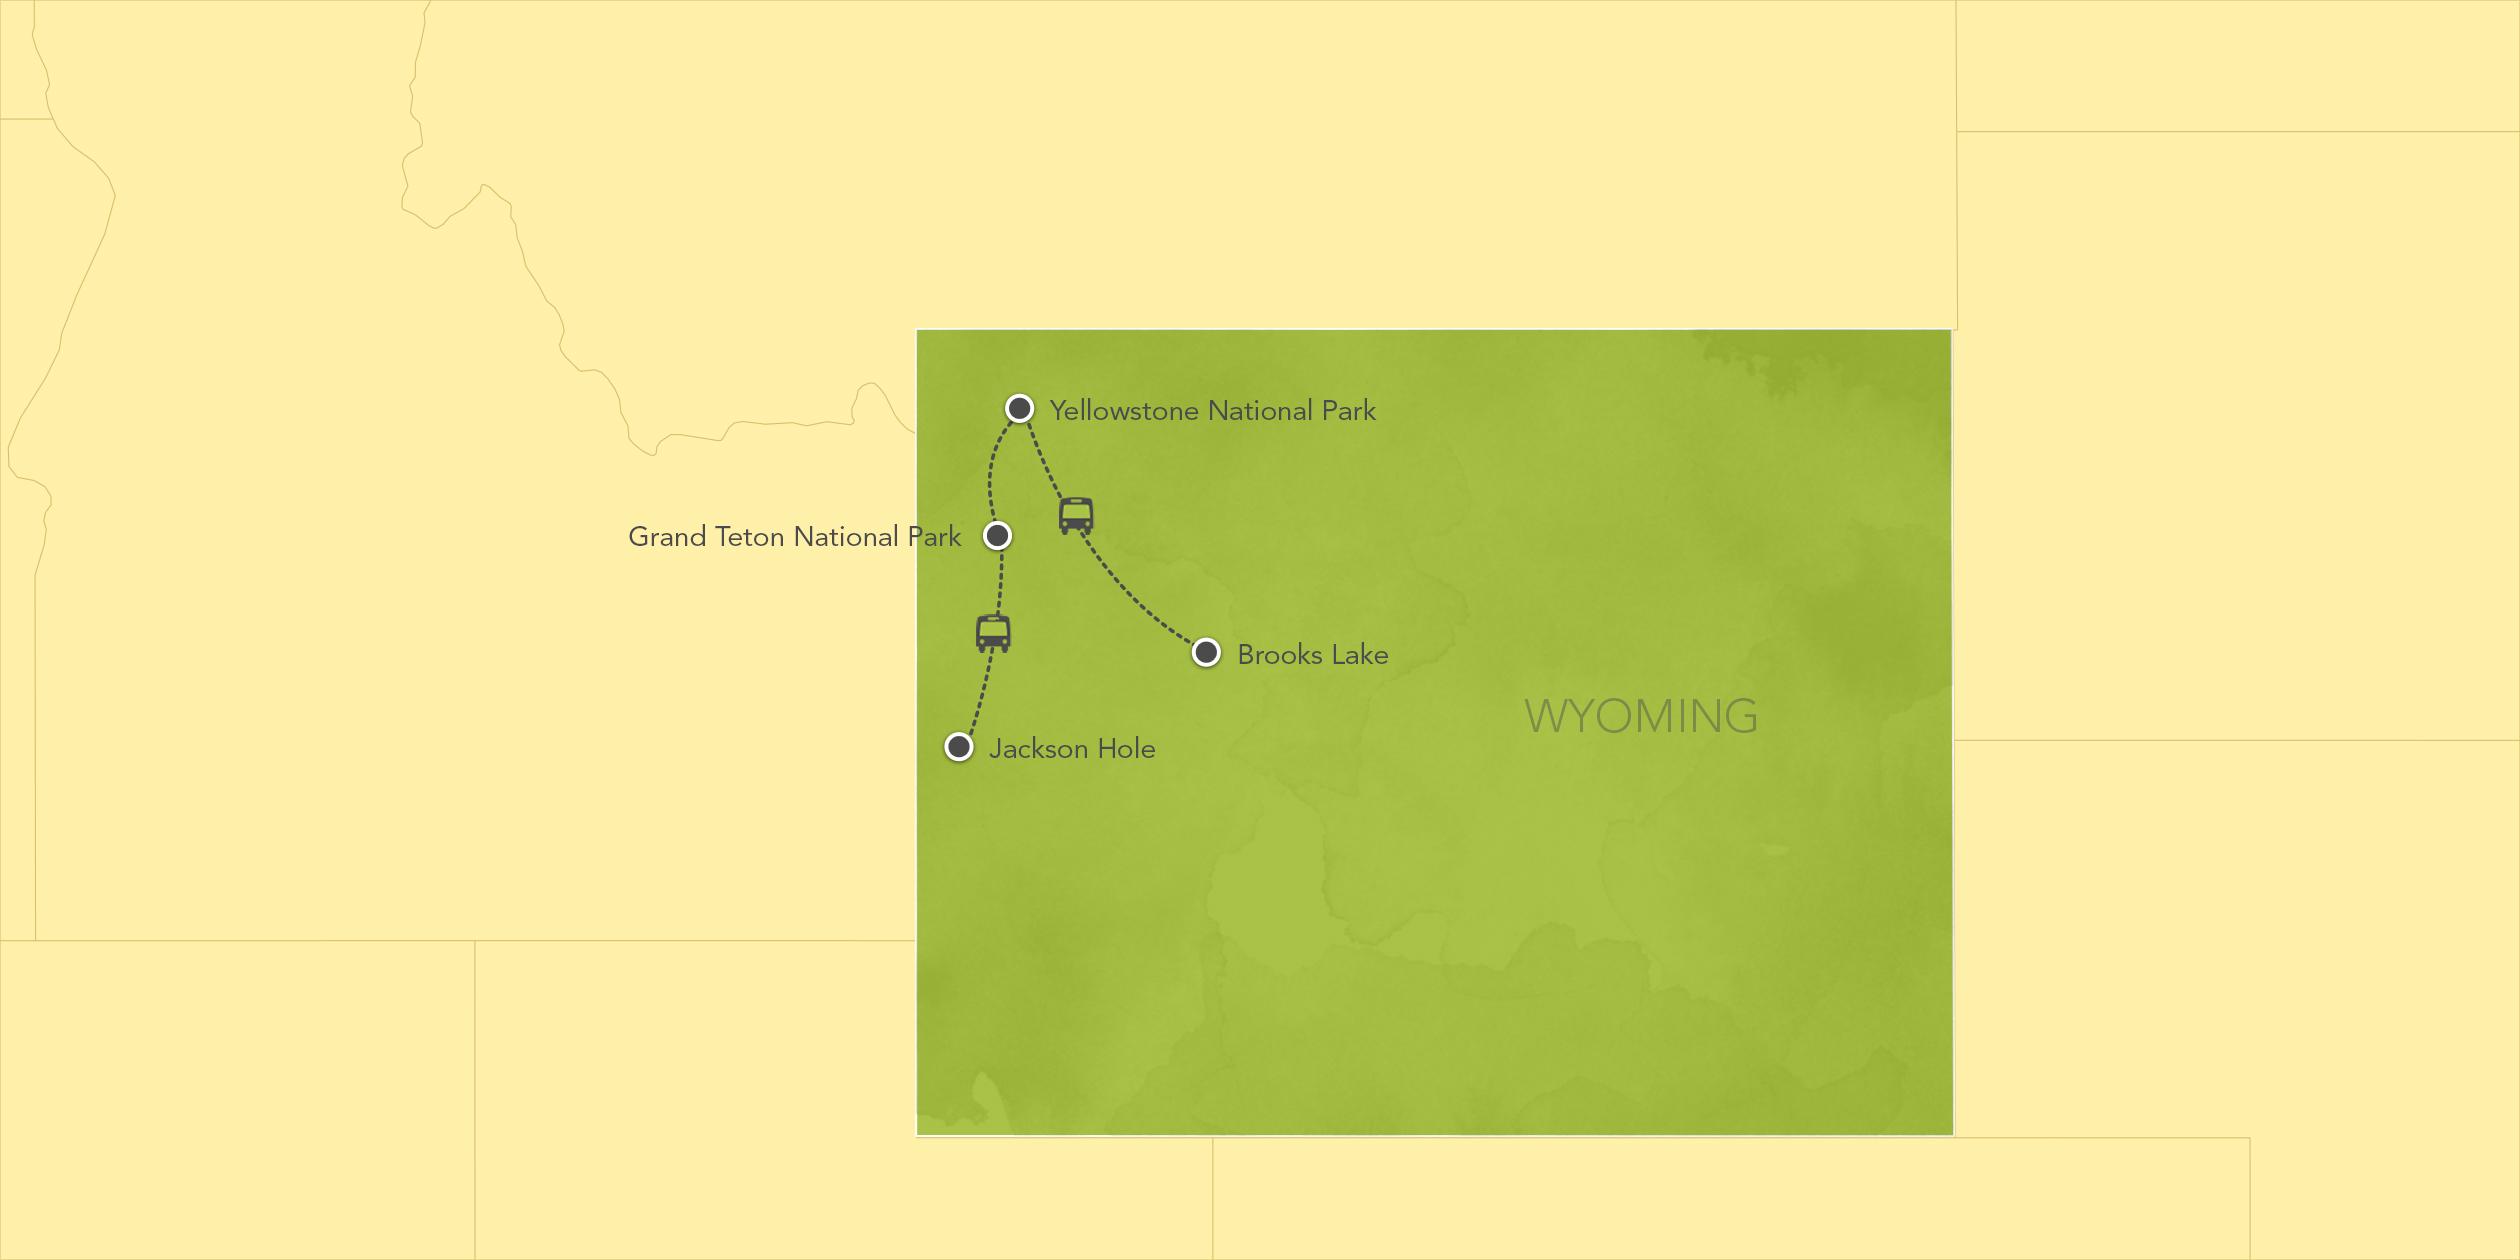 Itinerary map of Wyoming: Jackson Hole, Brooks Lake, Grand Teton National Park, Yellowstone National Park 2017>